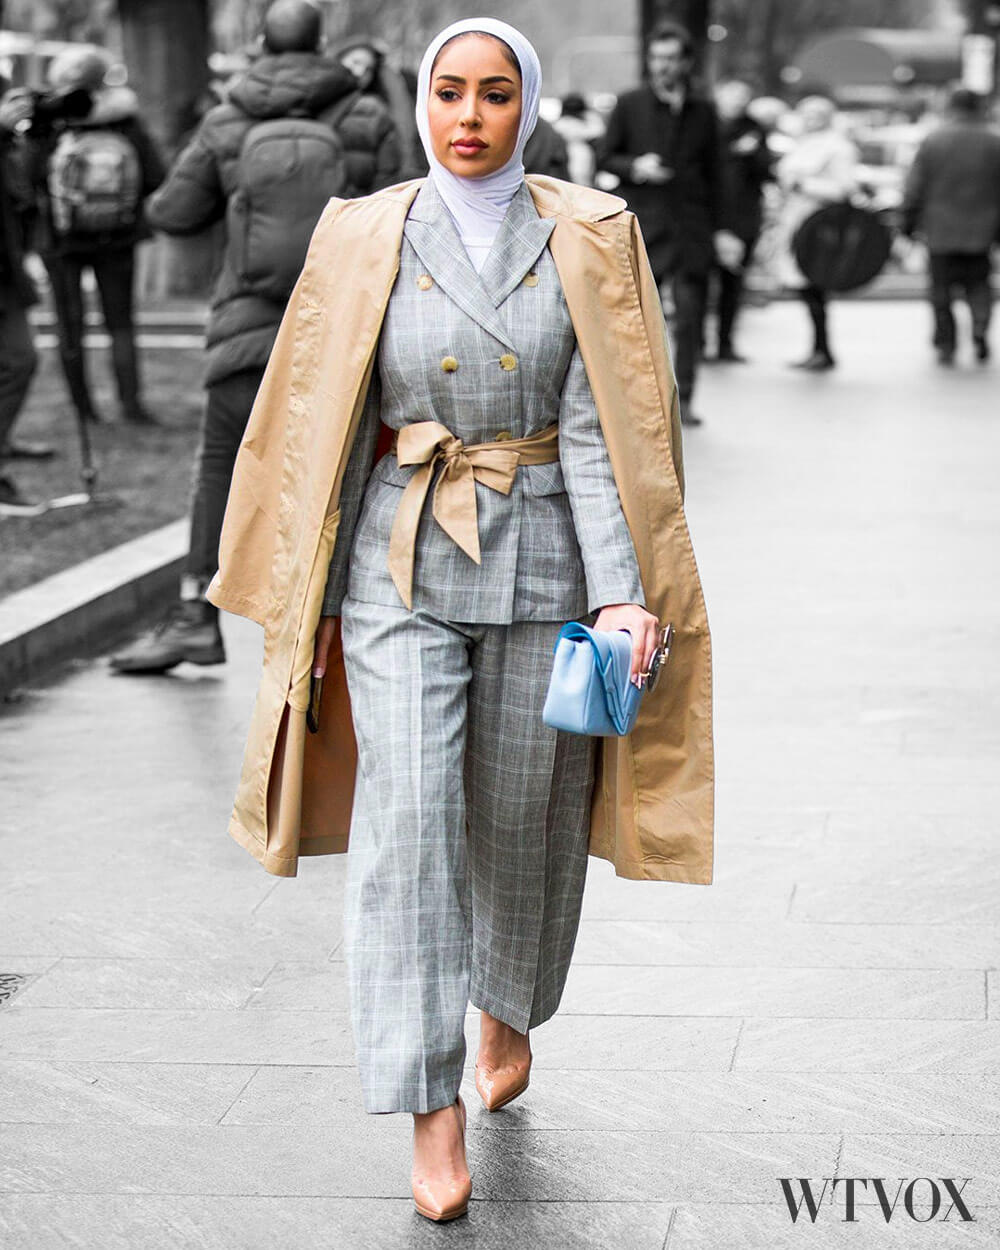 Modern Arabic fashion